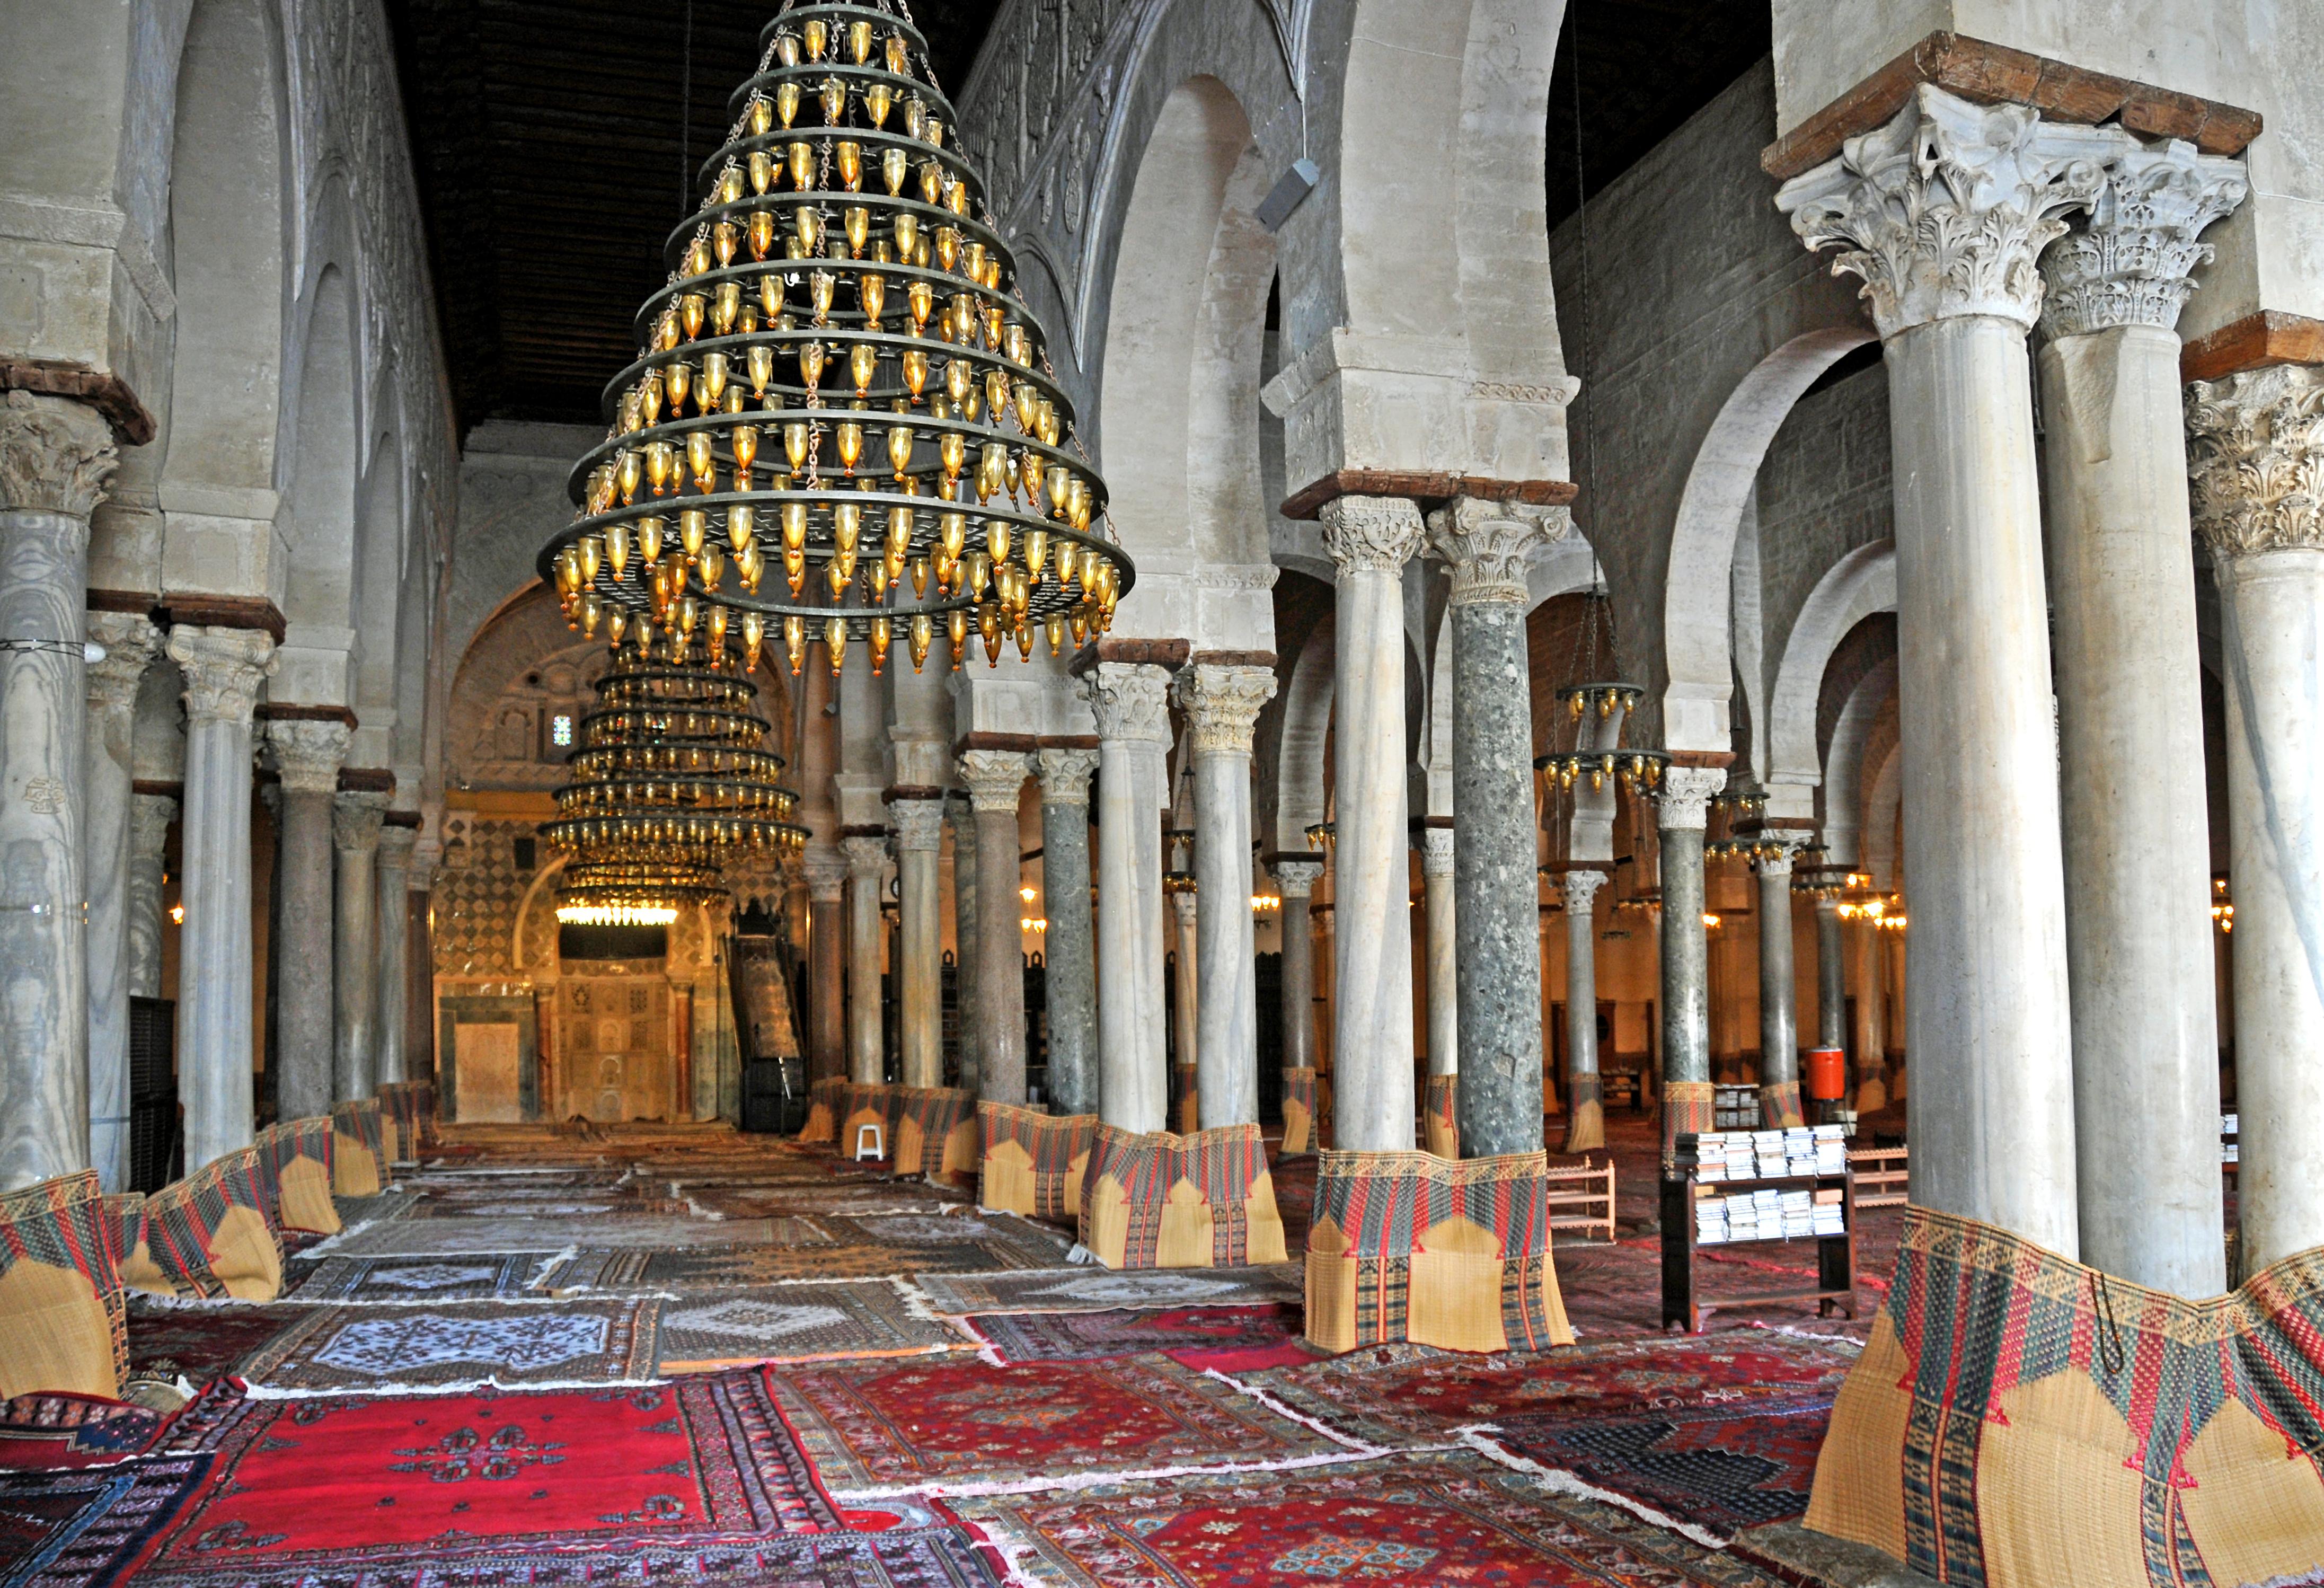 File:Great Mosque of Kairouan, prayer hall.jpg - Wikimedia Commons